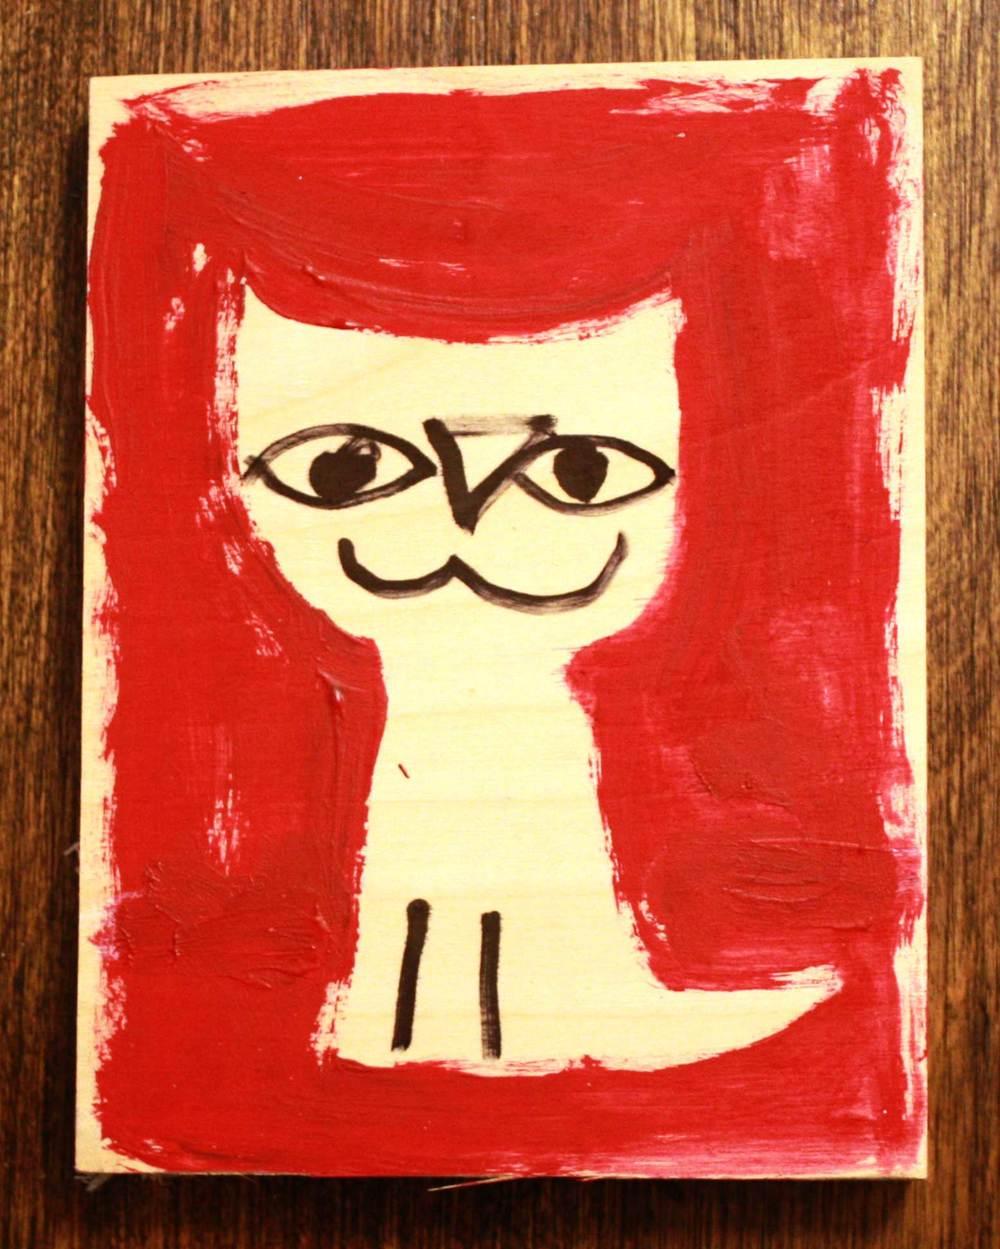 Cat illustration for an art scavenger hunt in Leominster, MA